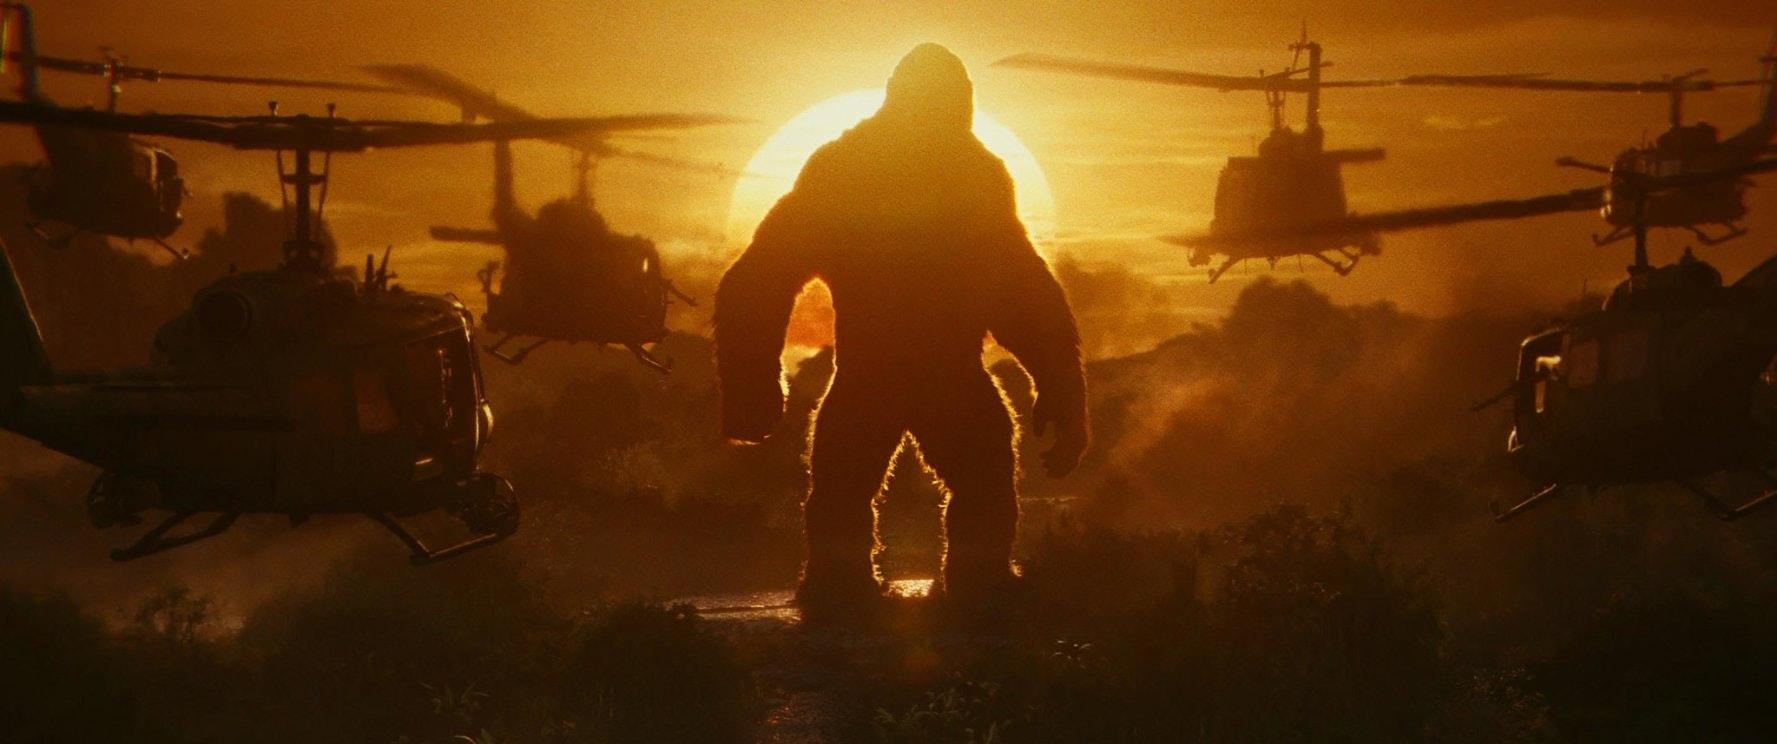 Kong: Skull Island. Unser liebster Riesengorilla ist zurück